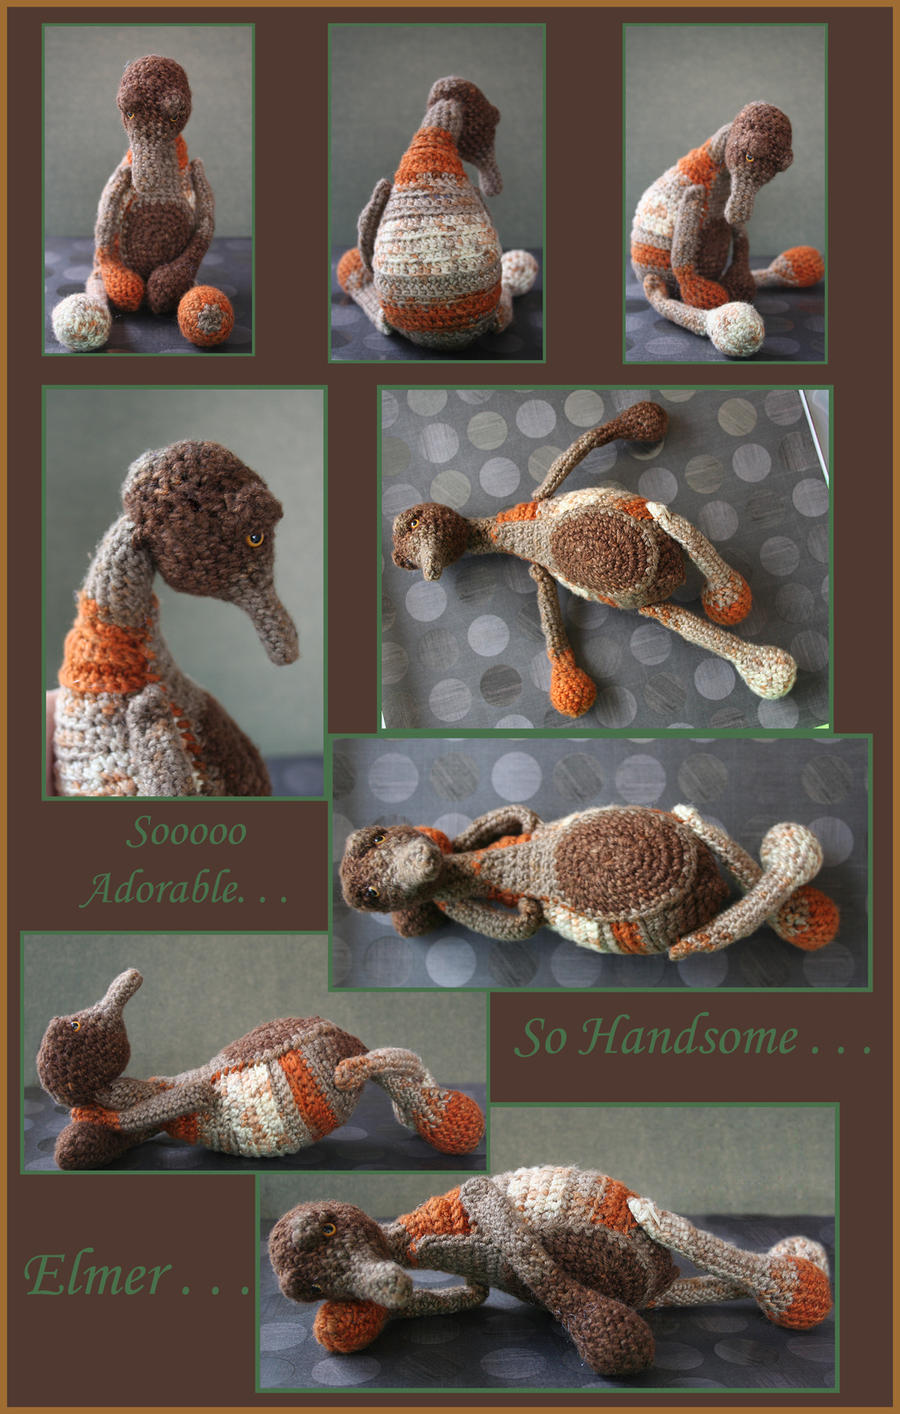 Elmer the real Elmer by DarkRaven17